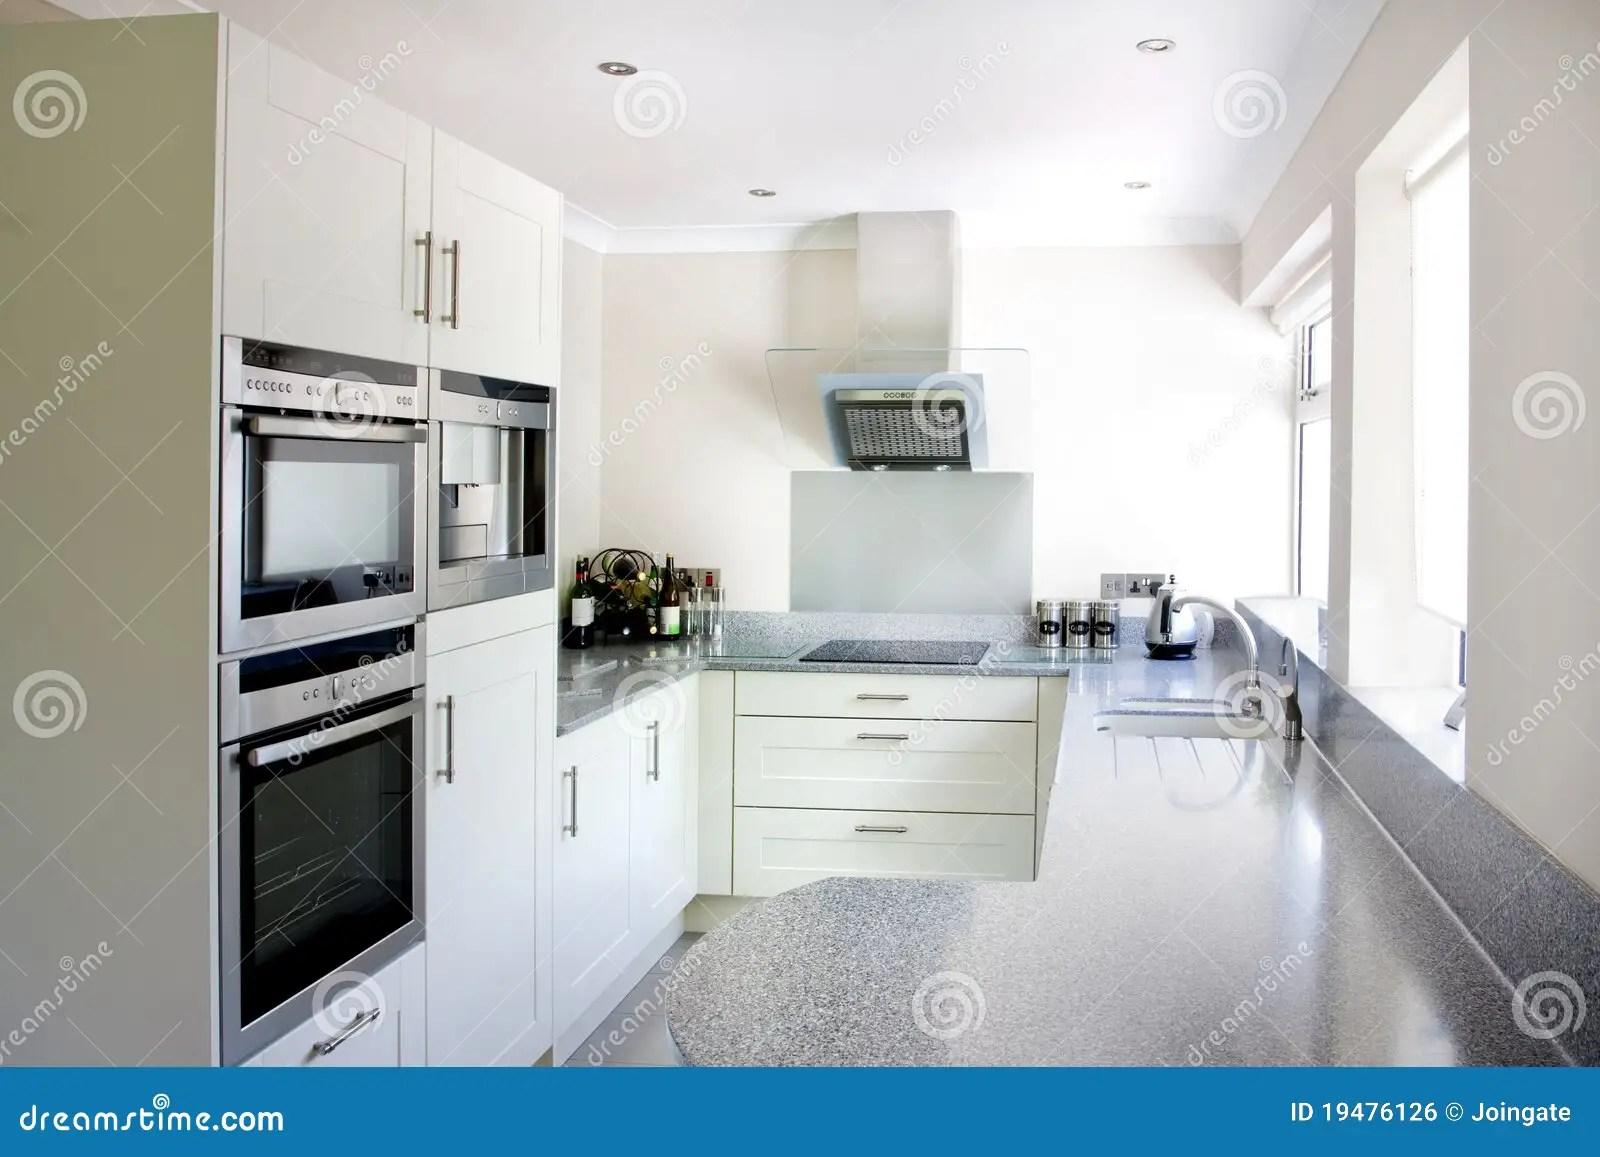 Piastrelle cucina bianca e nera le piastrelle diamantate